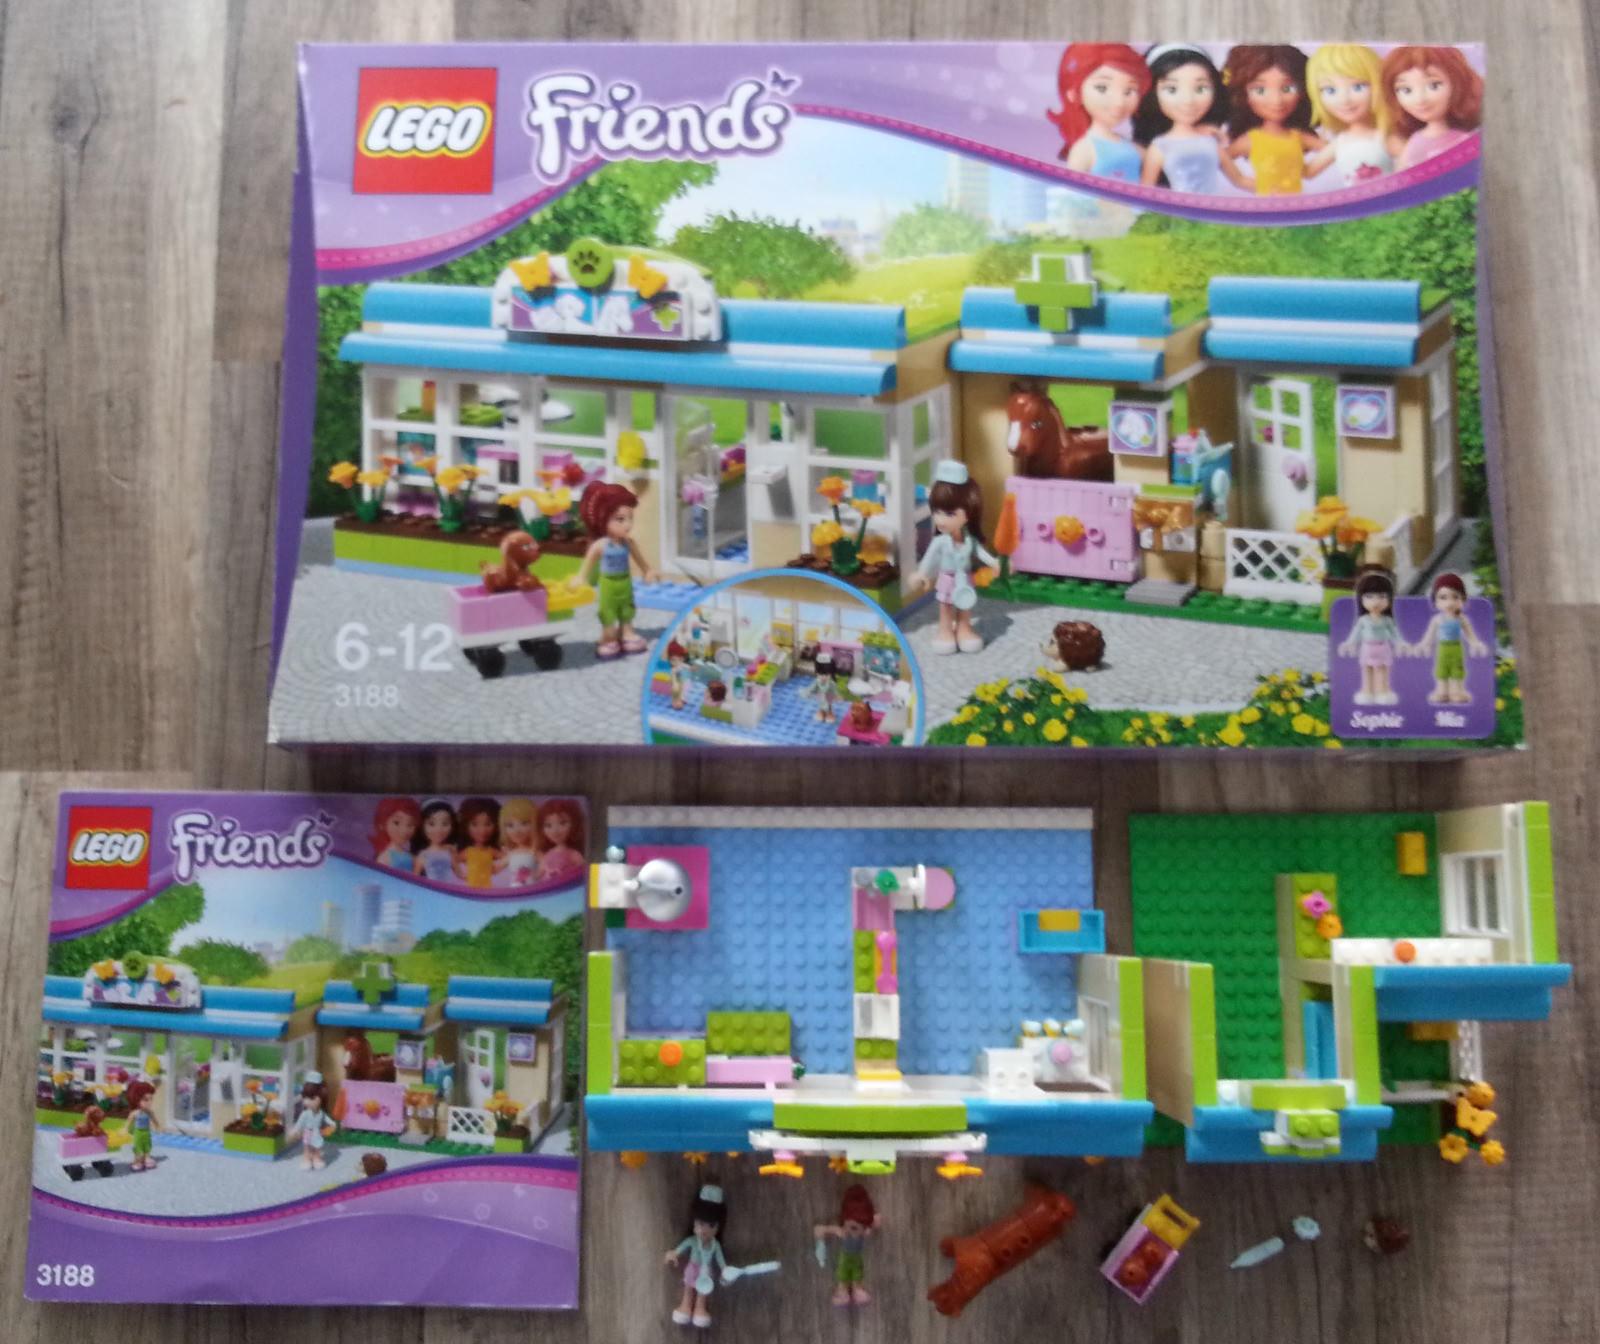 Lego Friends Friends Friends Tierarzt Praxis Tierklinik (3188) OVP mit Bauanleitung 8e1ae1